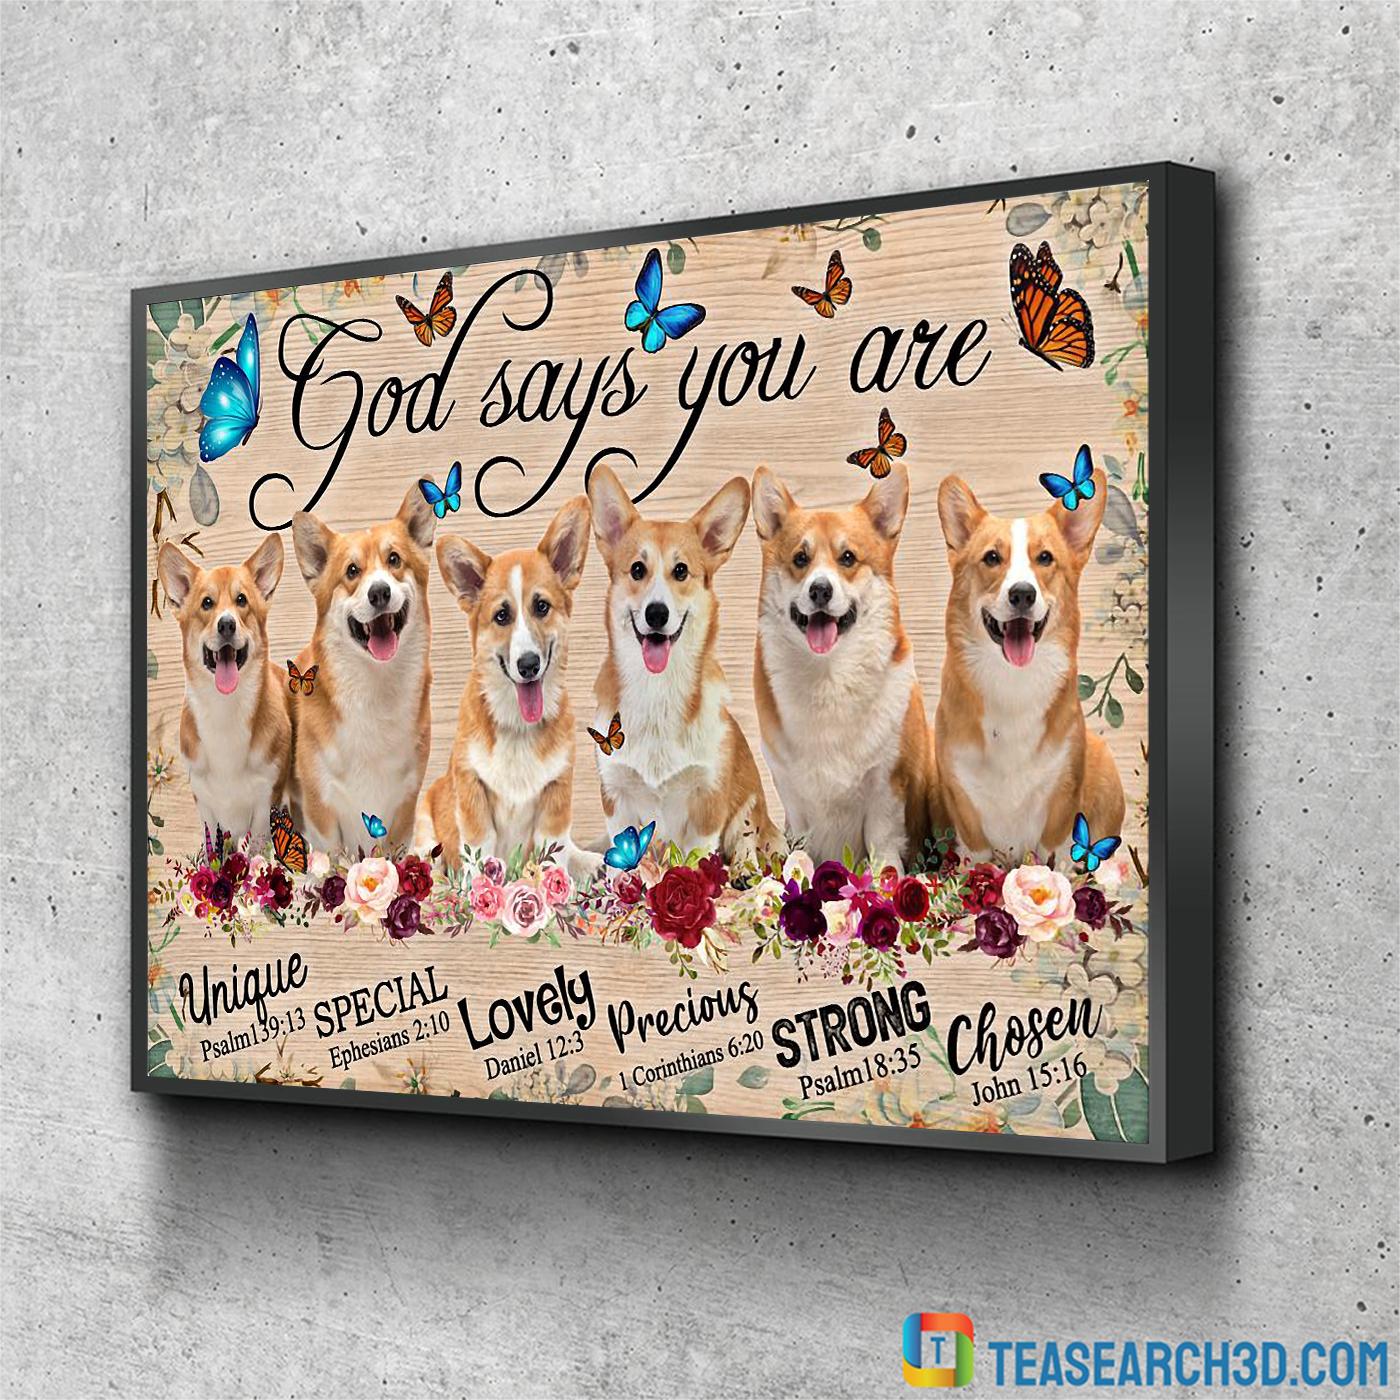 Corgi god says you are poster A1